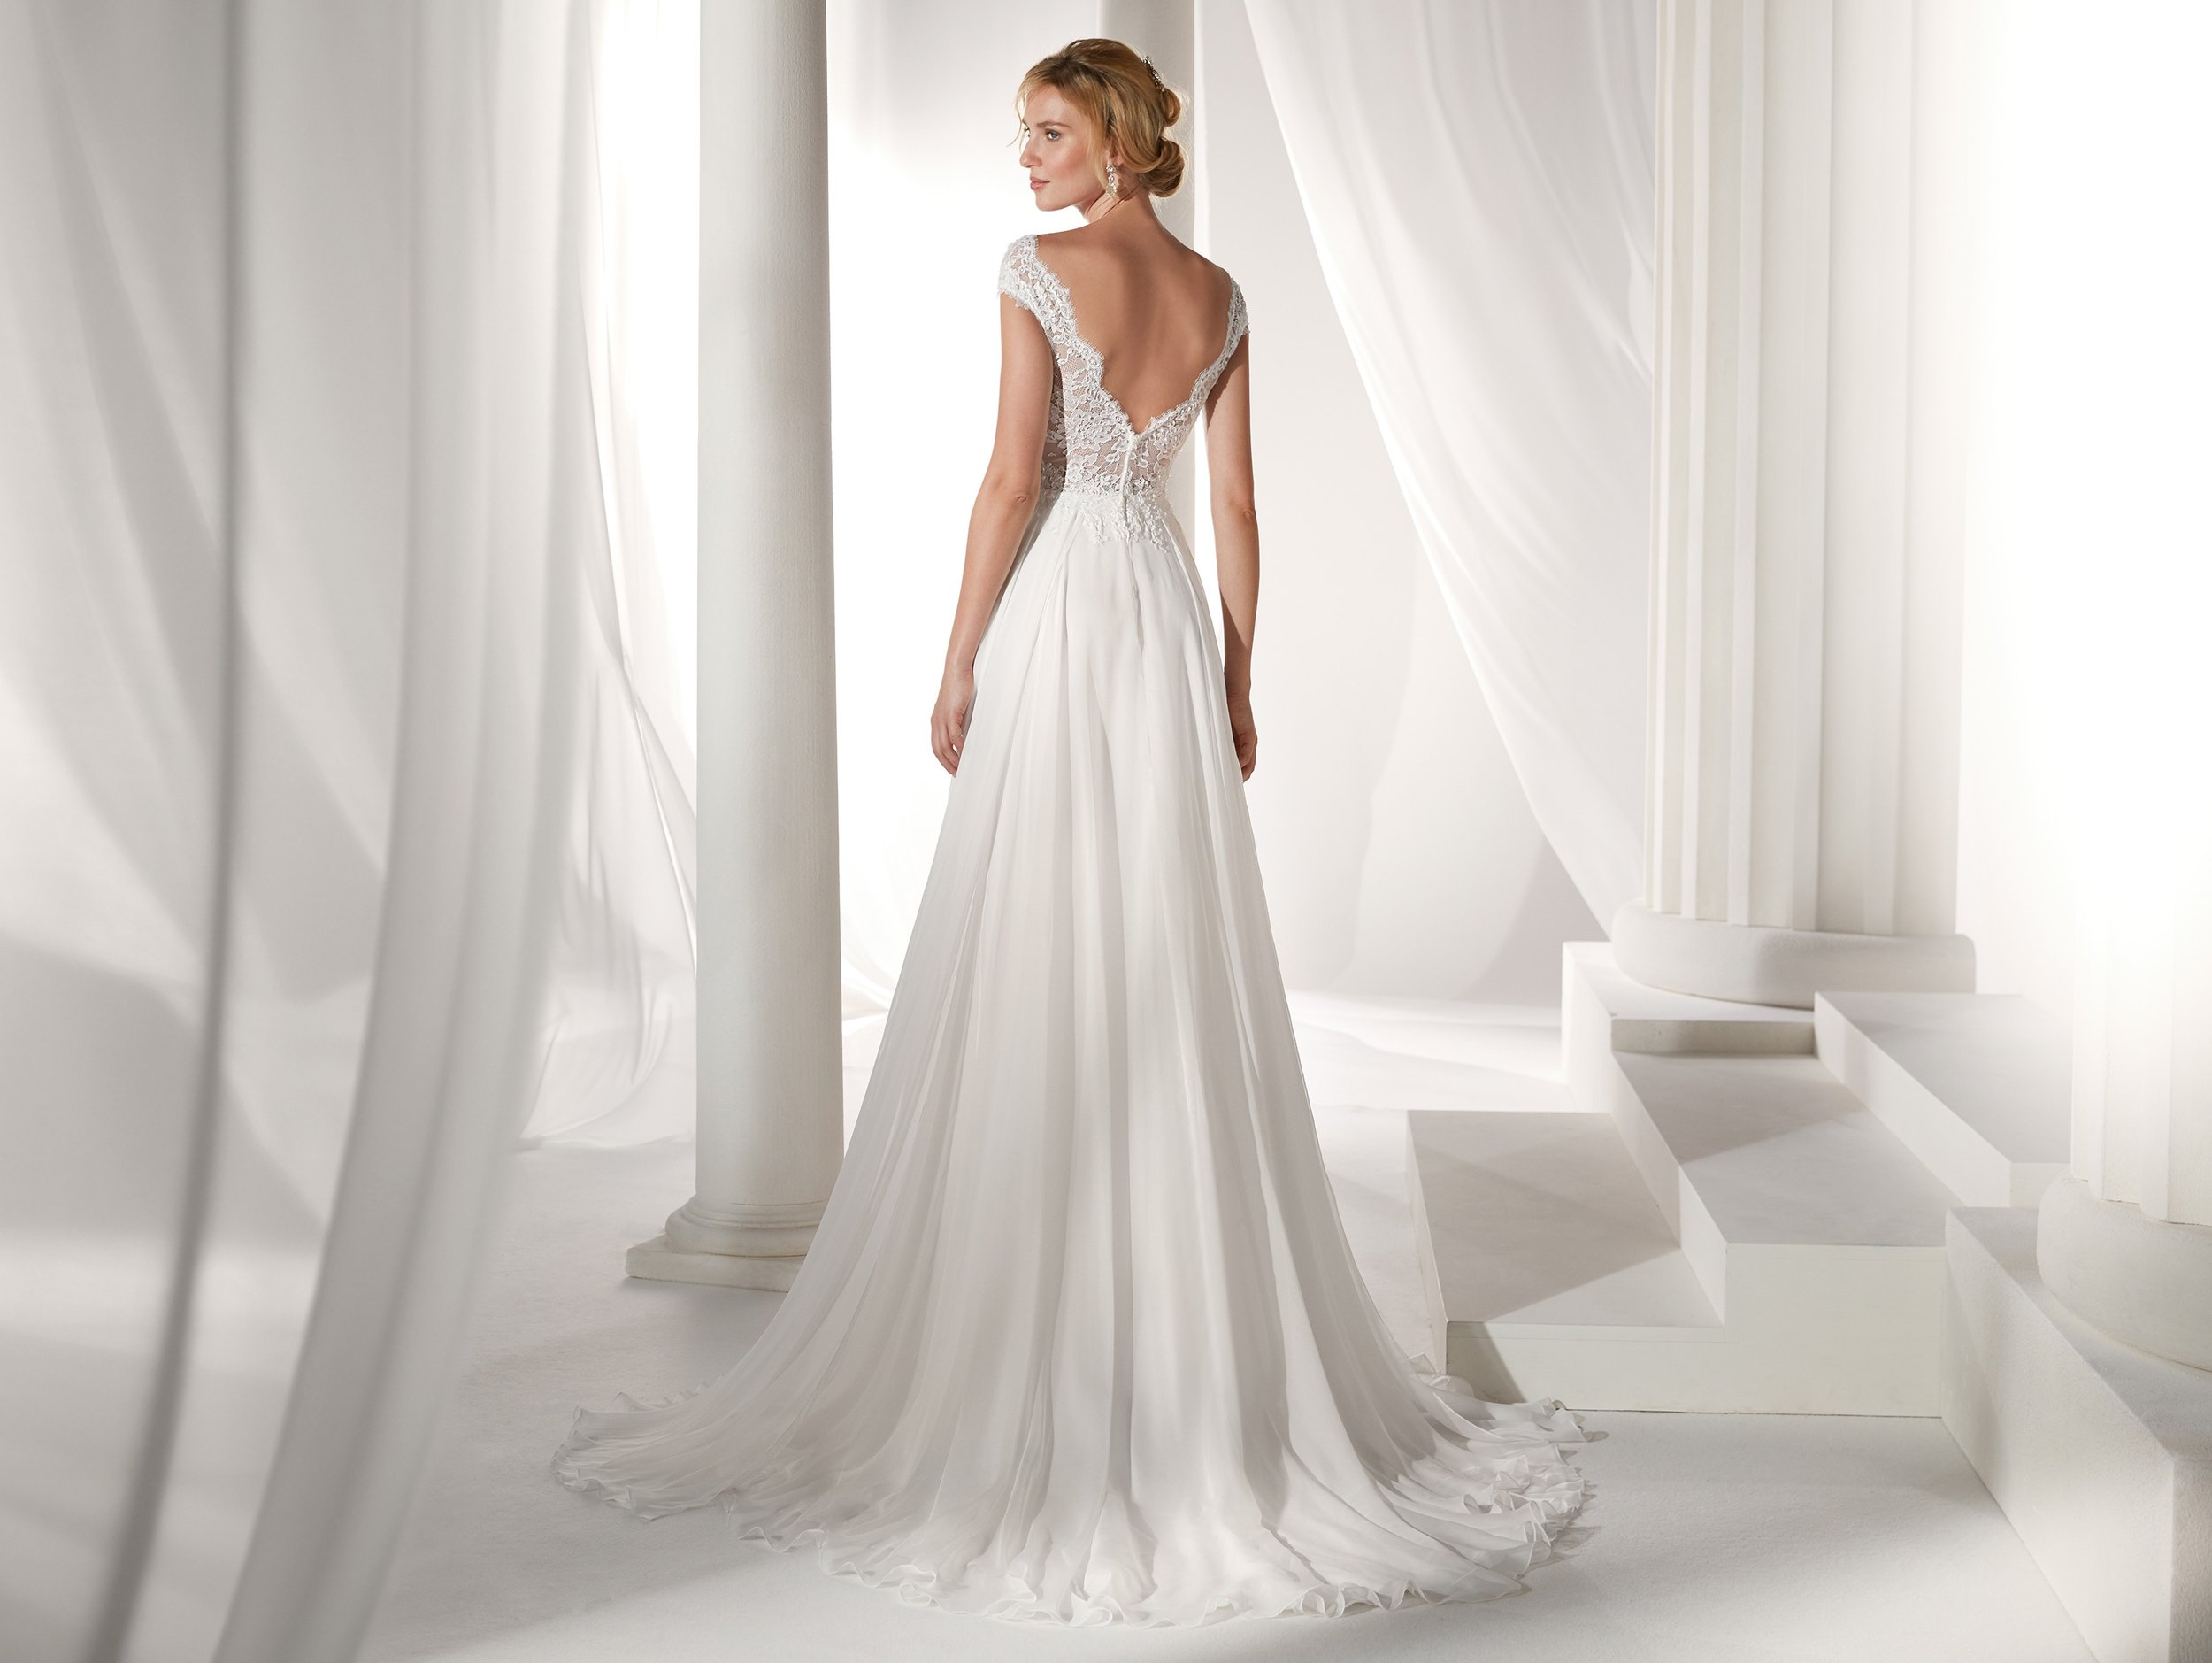 nicole-spose-NIAB19012-Nicole-moda-sposa-2019-719.jpg